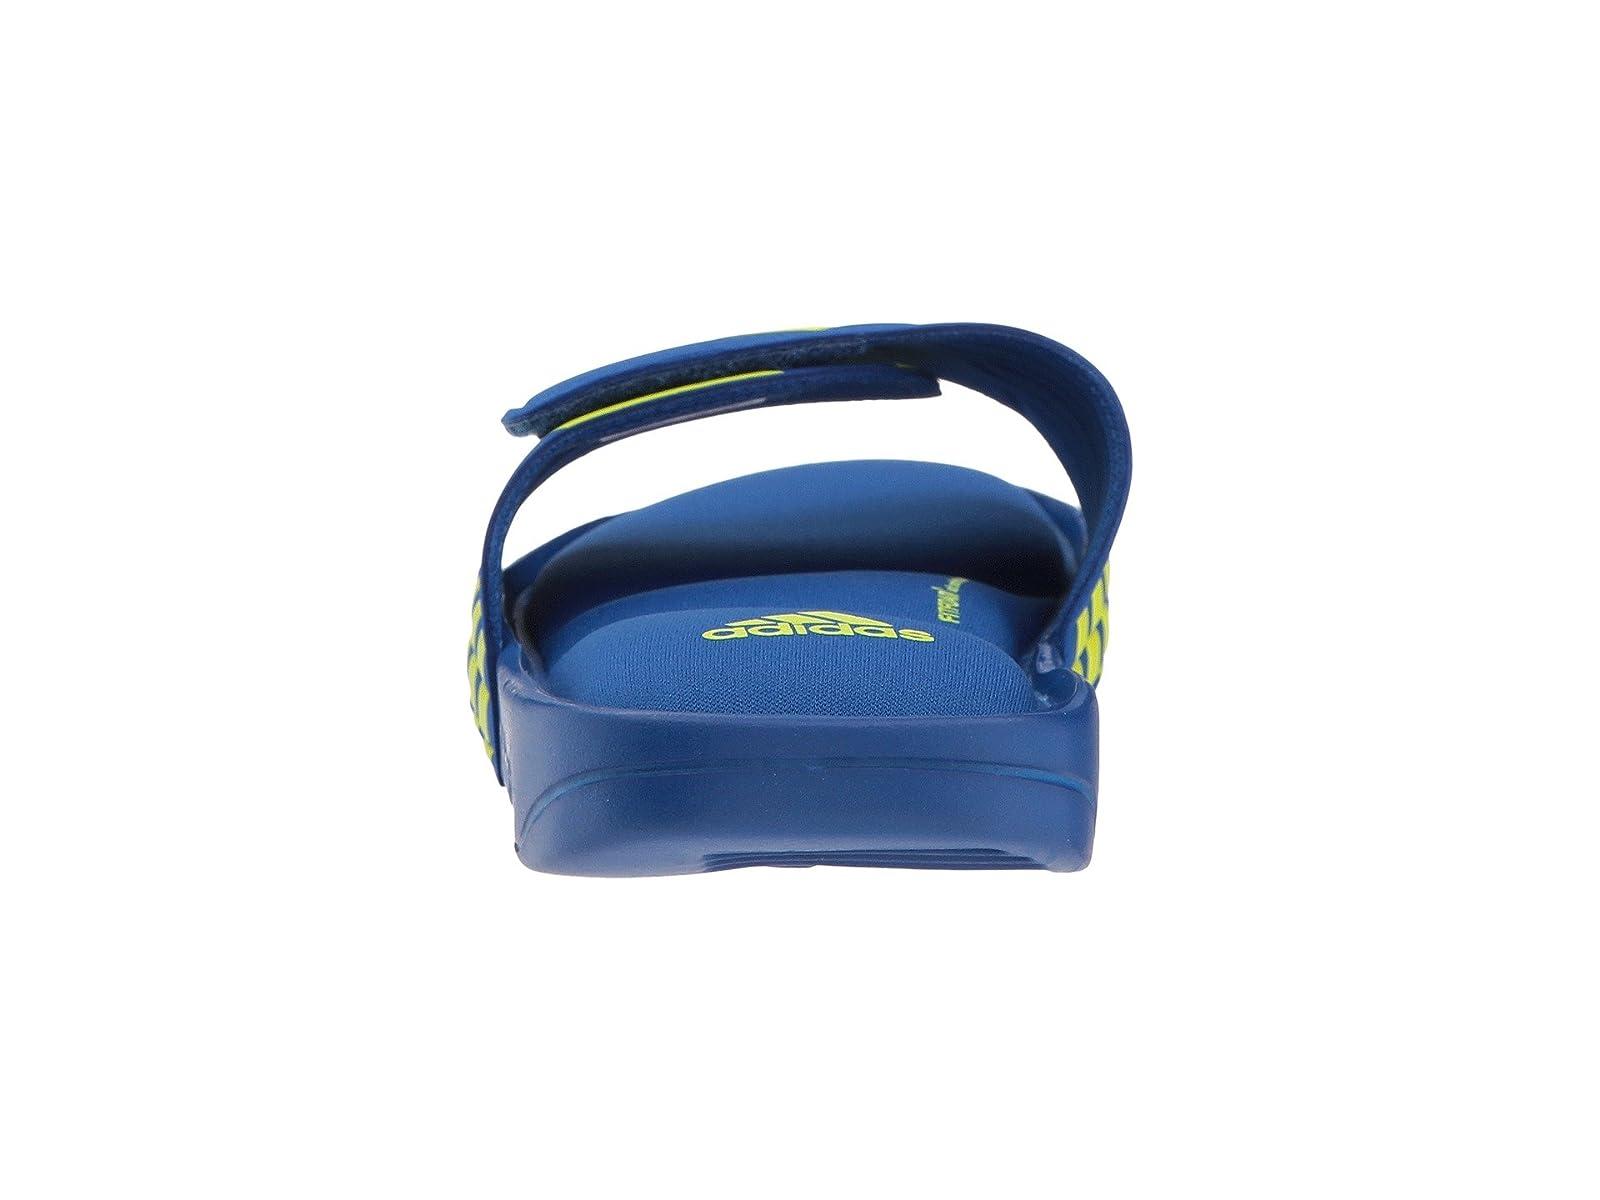 buy online 89ce7 f5df0 Comfort Adidas petit Adissage Enfant Enfants Grand qggYvwEZ